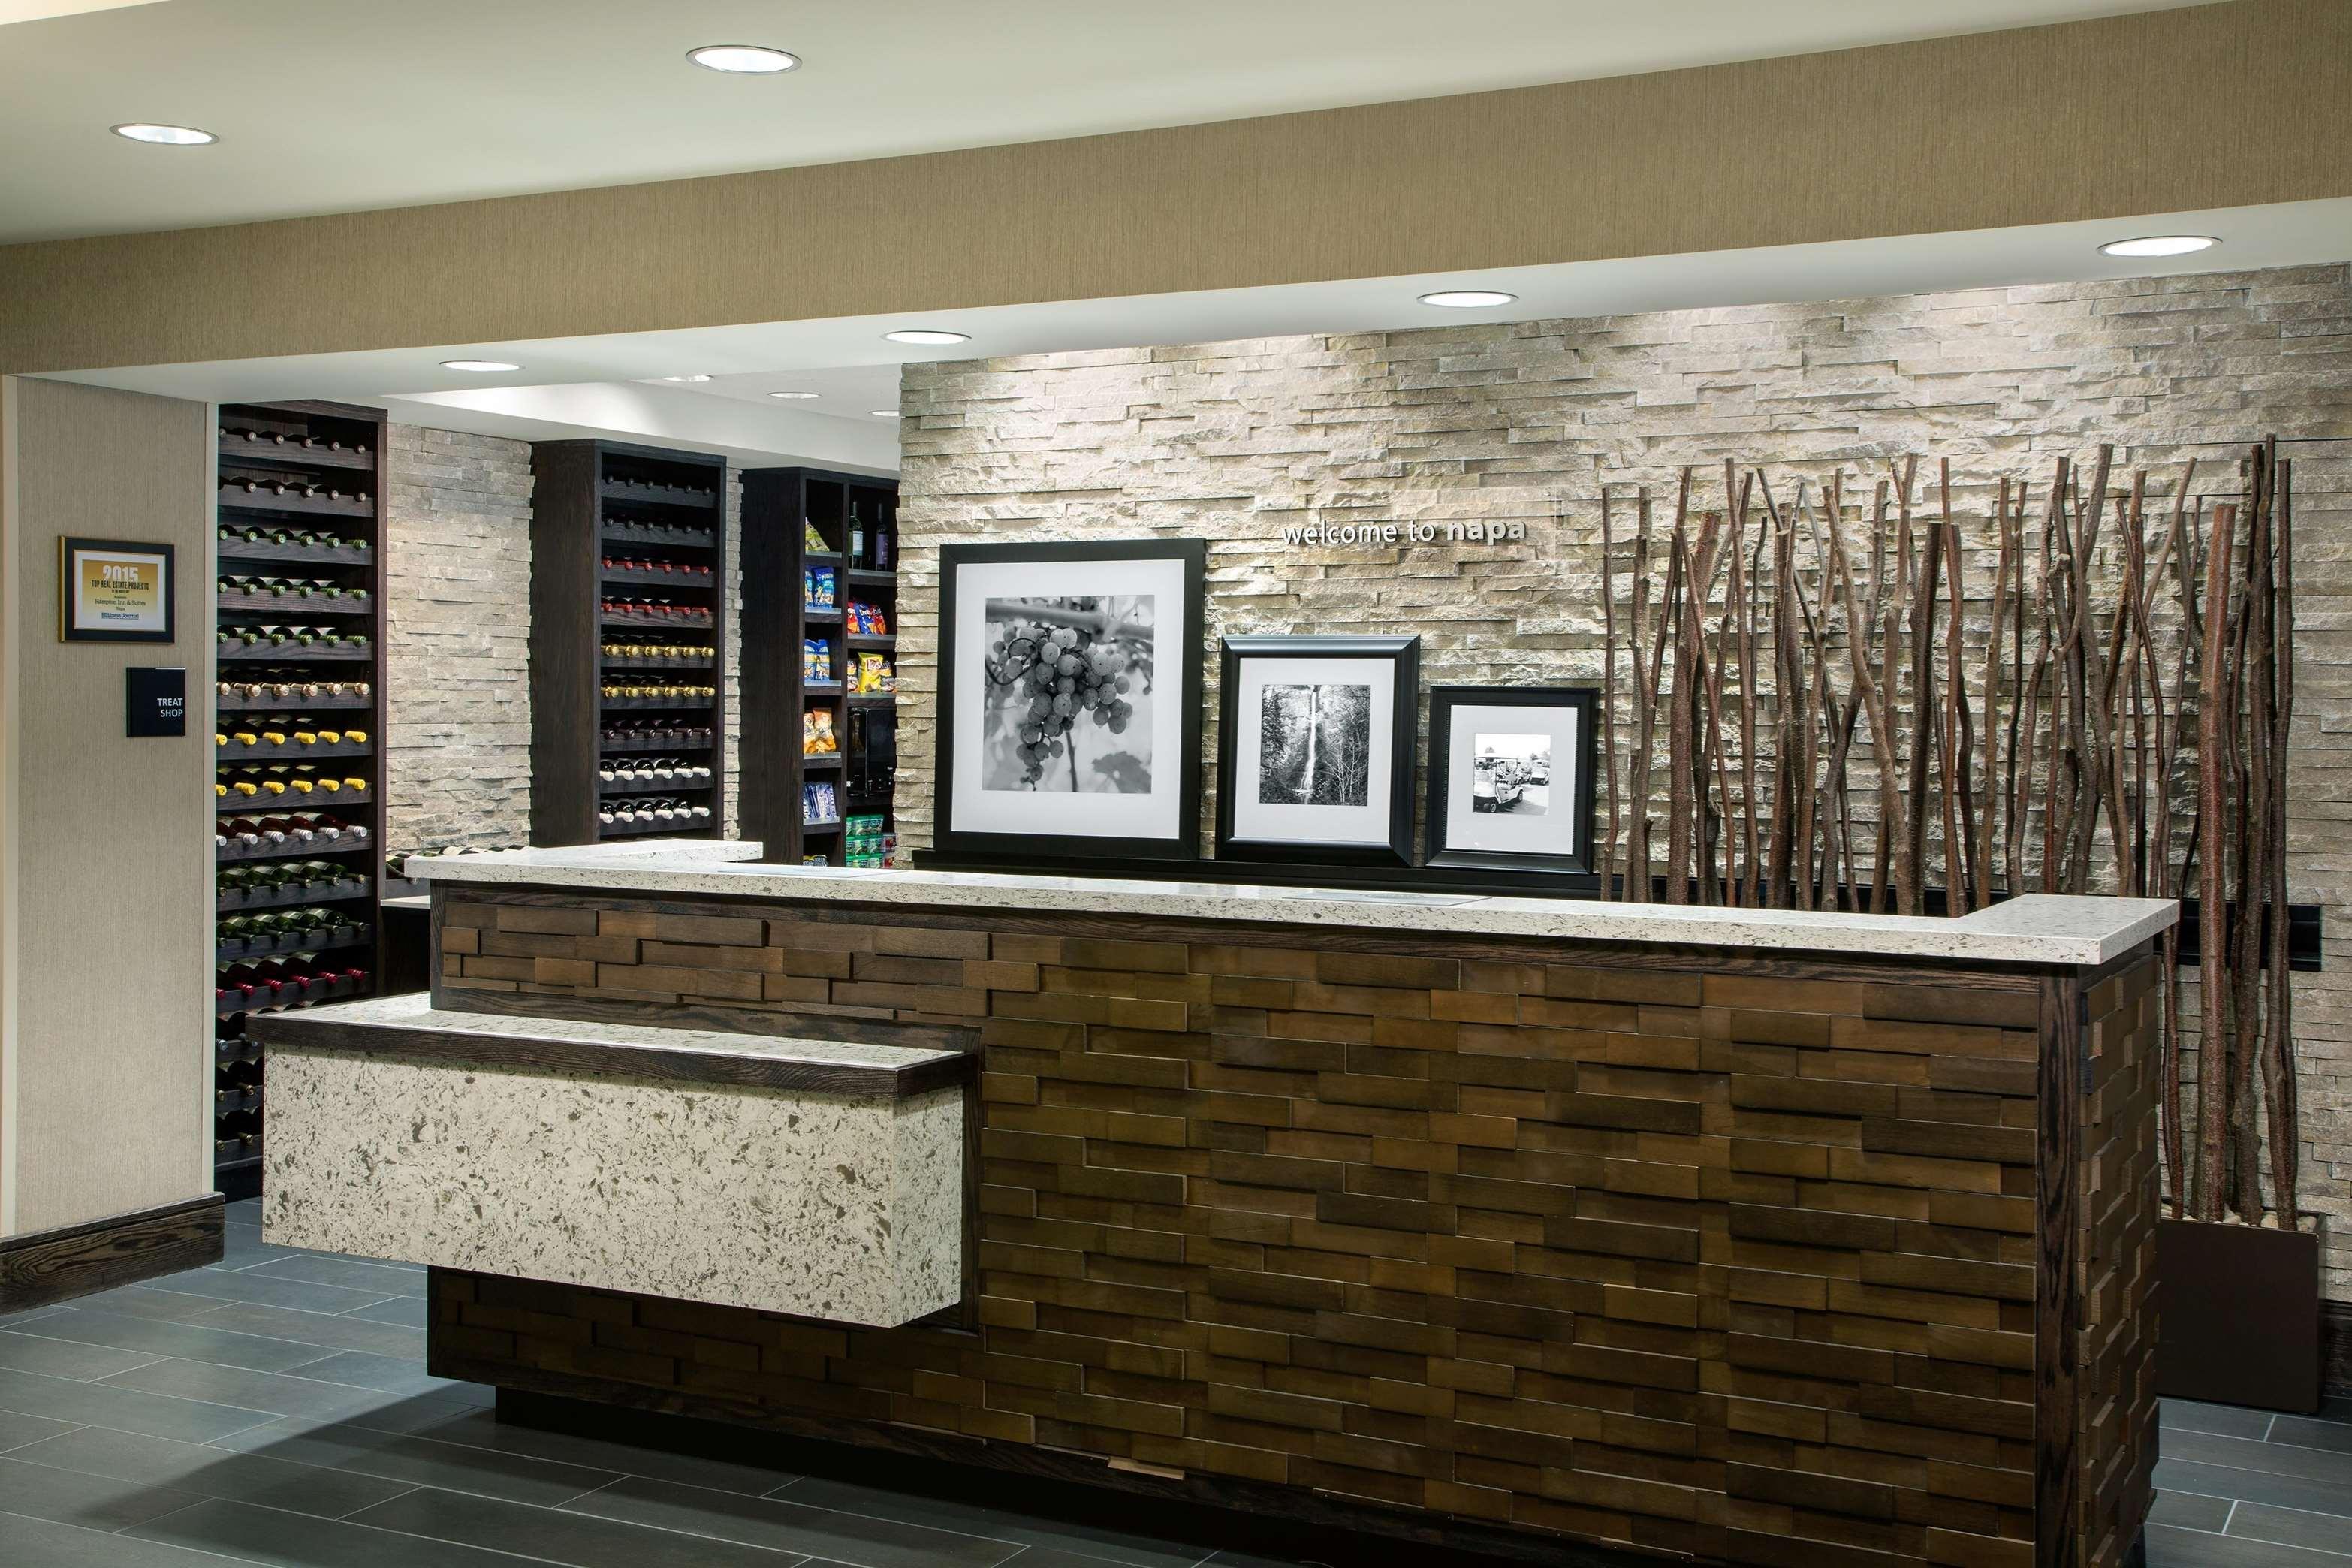 Hampton Inn & Suites Napa image 1